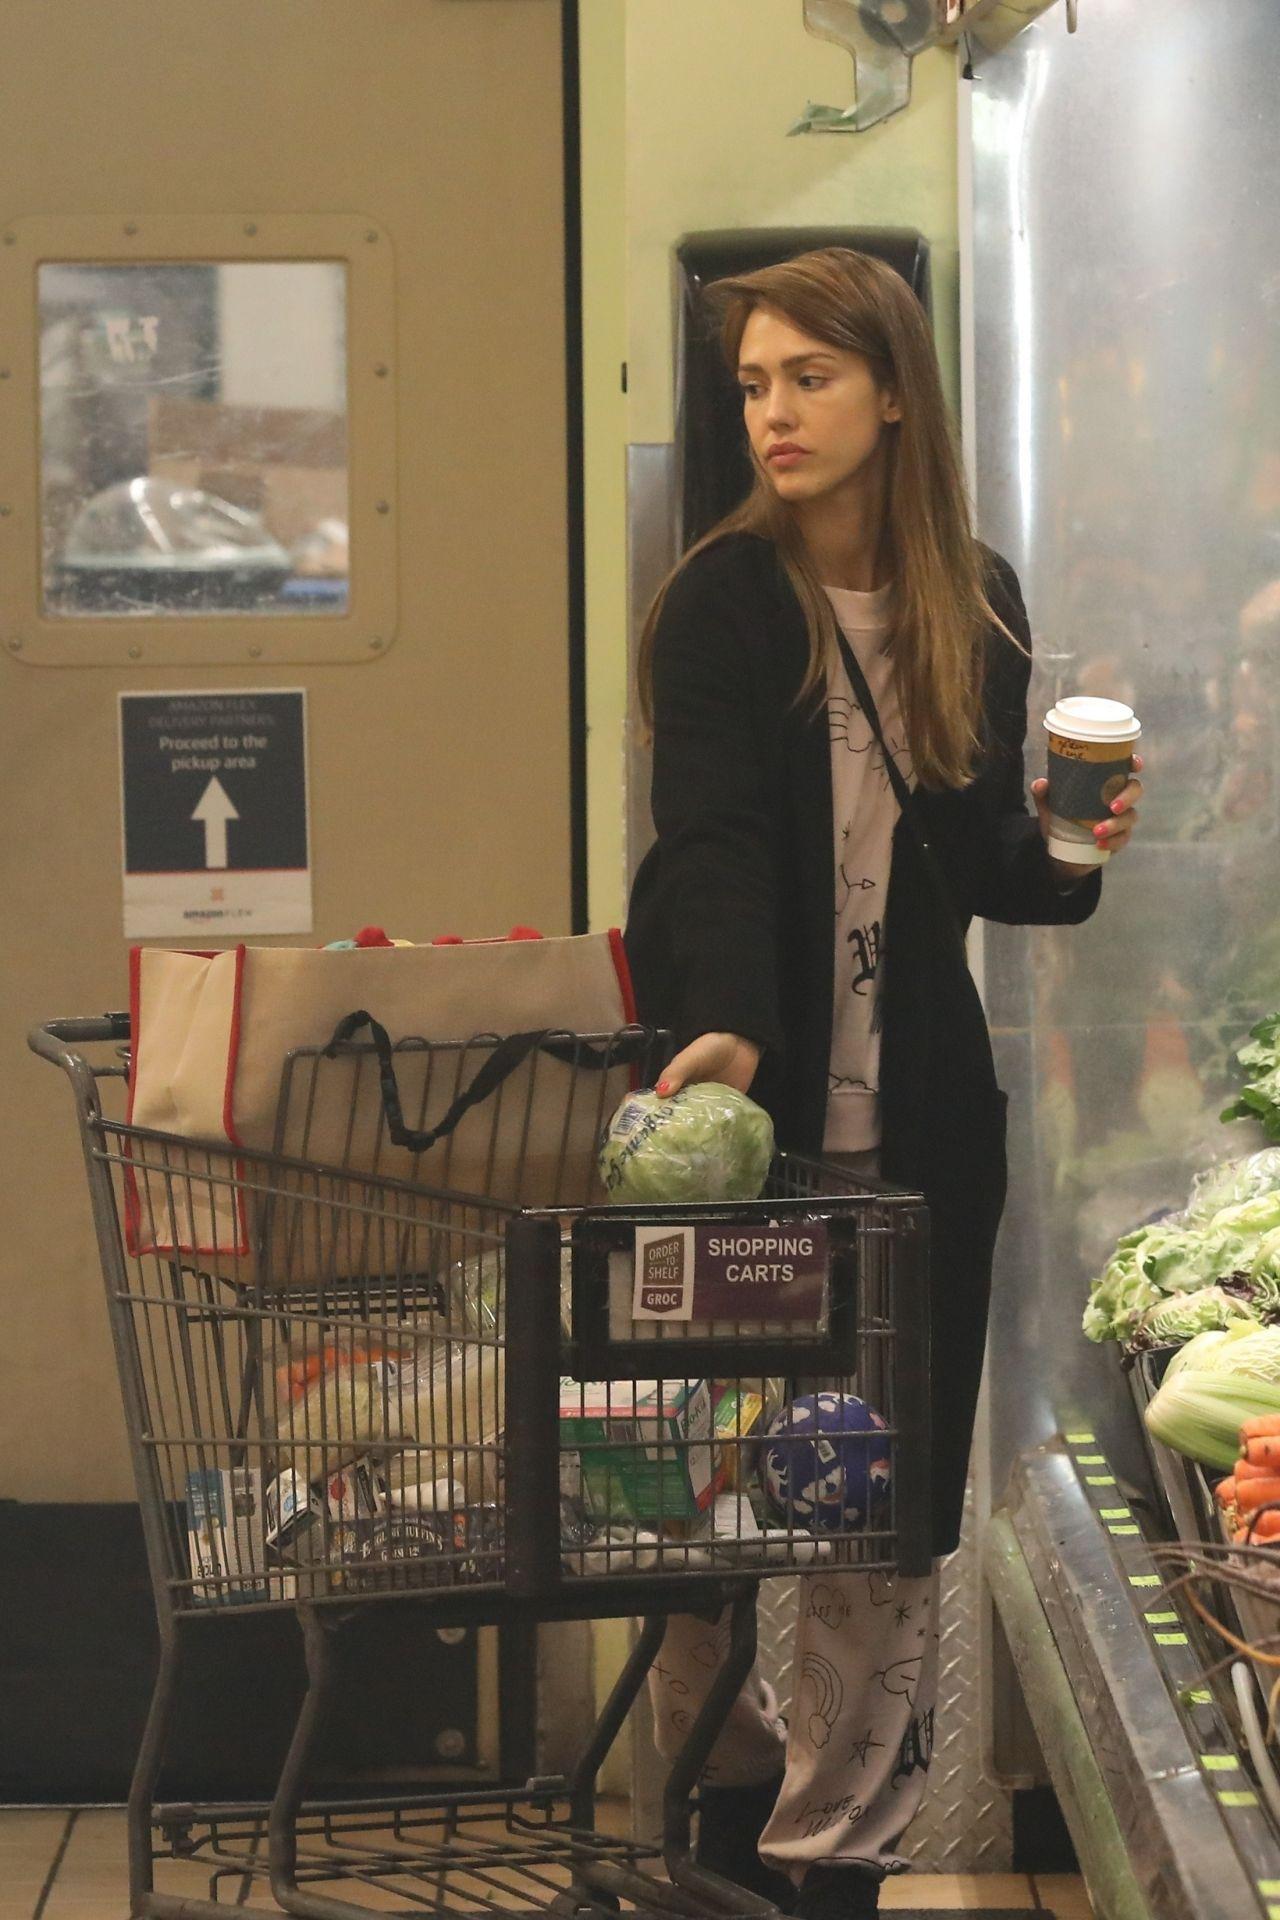 https://celebmafia.com/wp-content/uploads/2019/03/jessica-alba-shopping-at-whole-foods-market-in-beverly-hills-03-09-2019-1.jpg